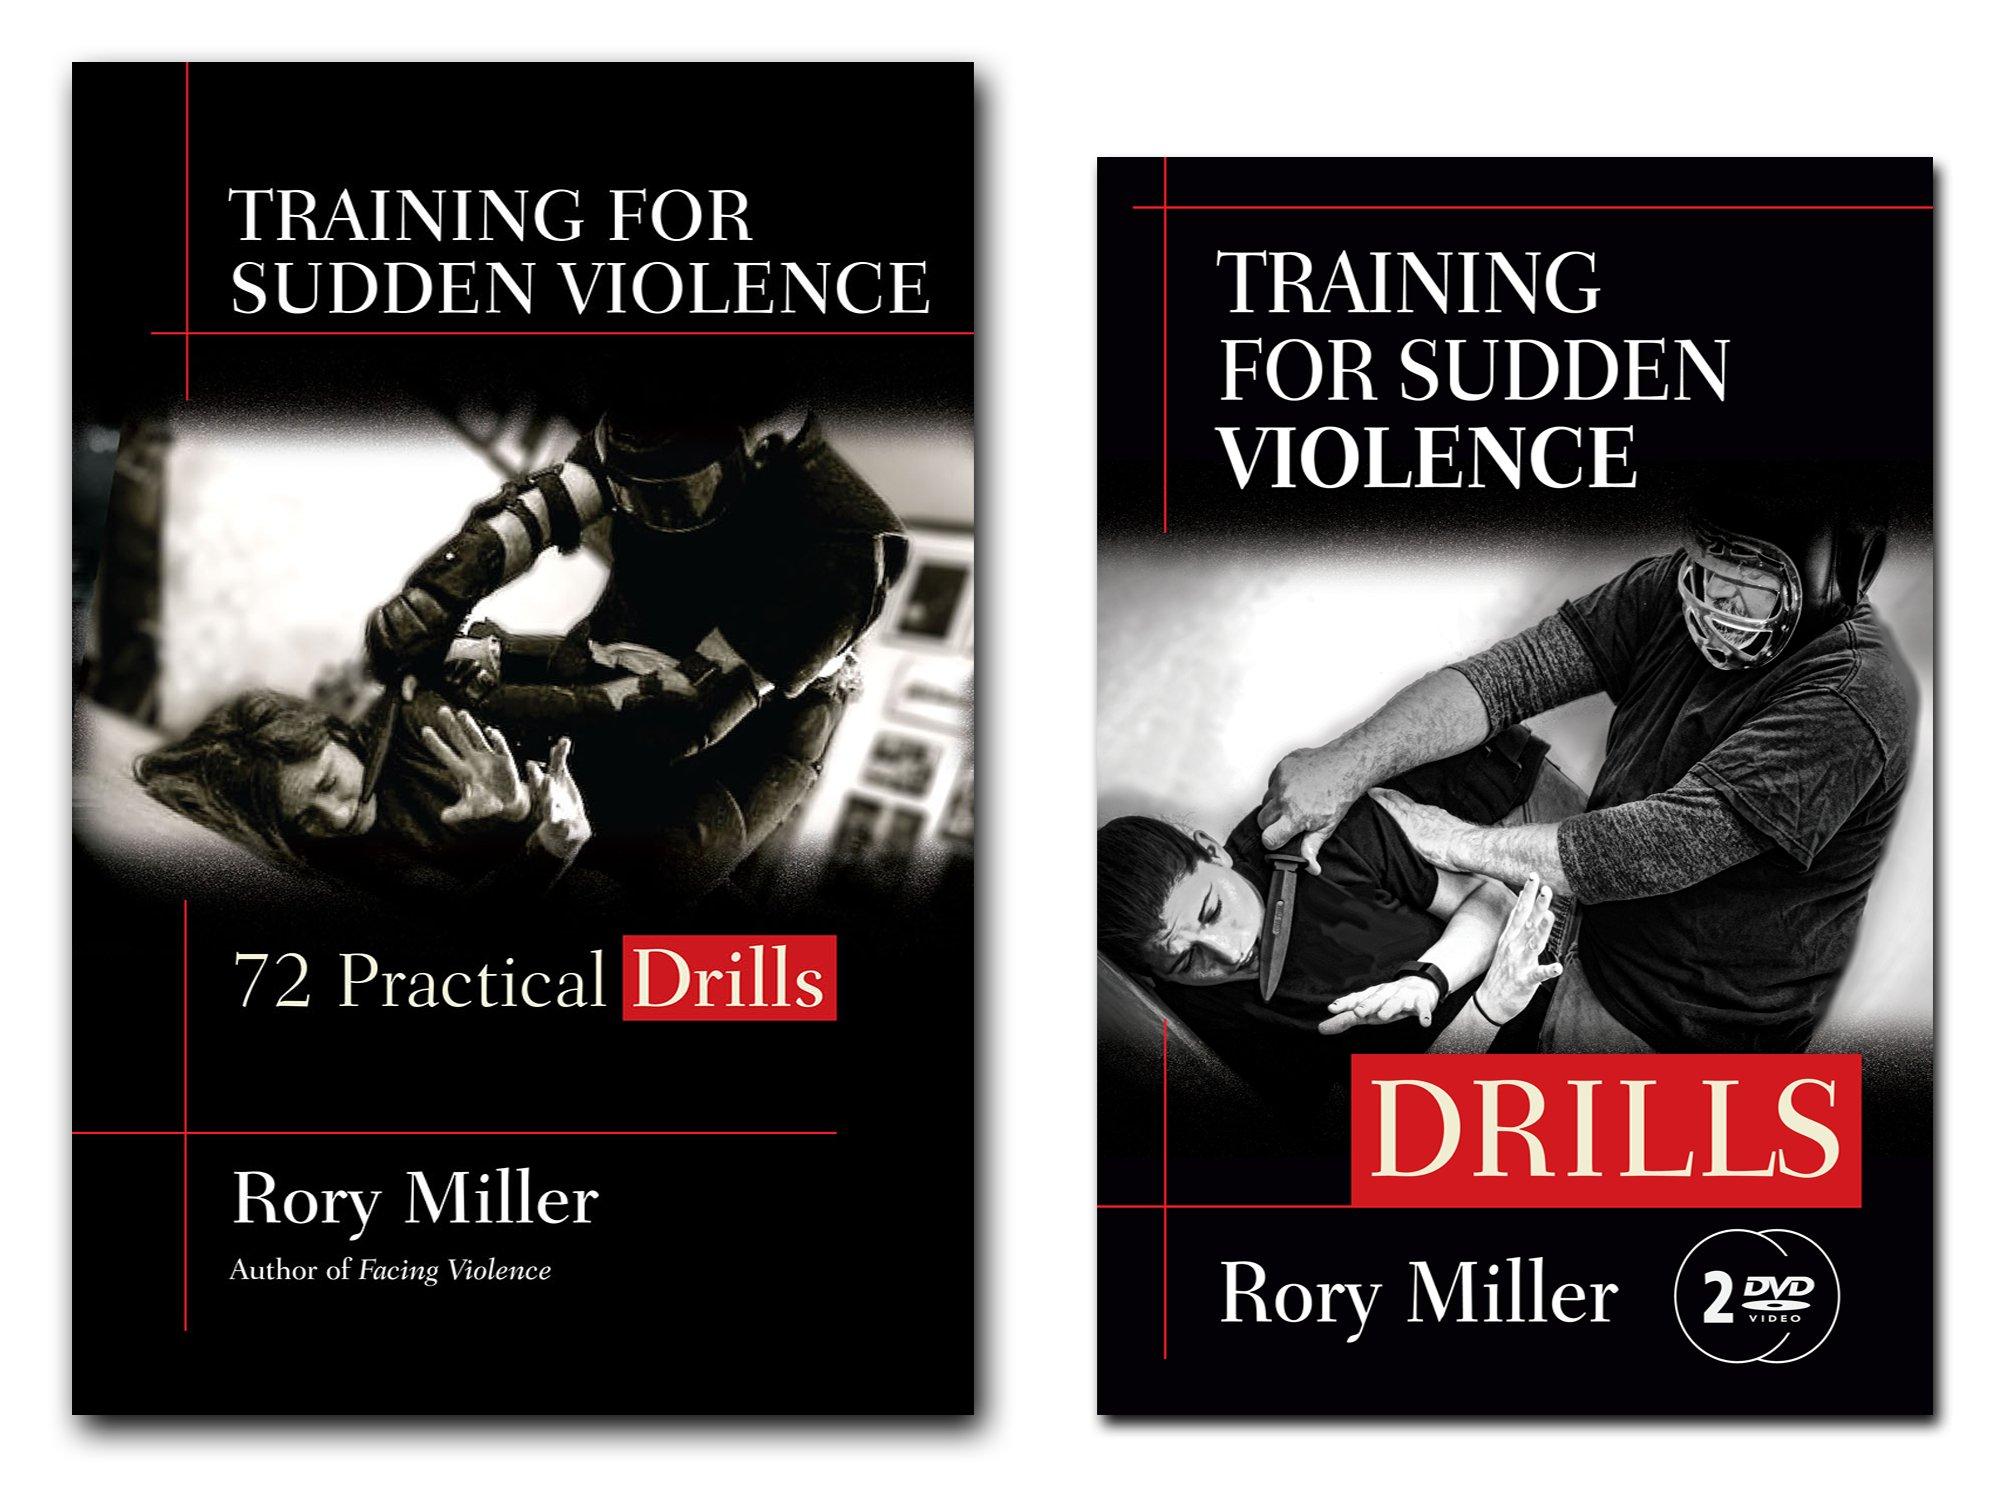 Download Bundle: Rory Miller's Training for Sudden Violence: DRILLS book and 2-DVD set pdf epub